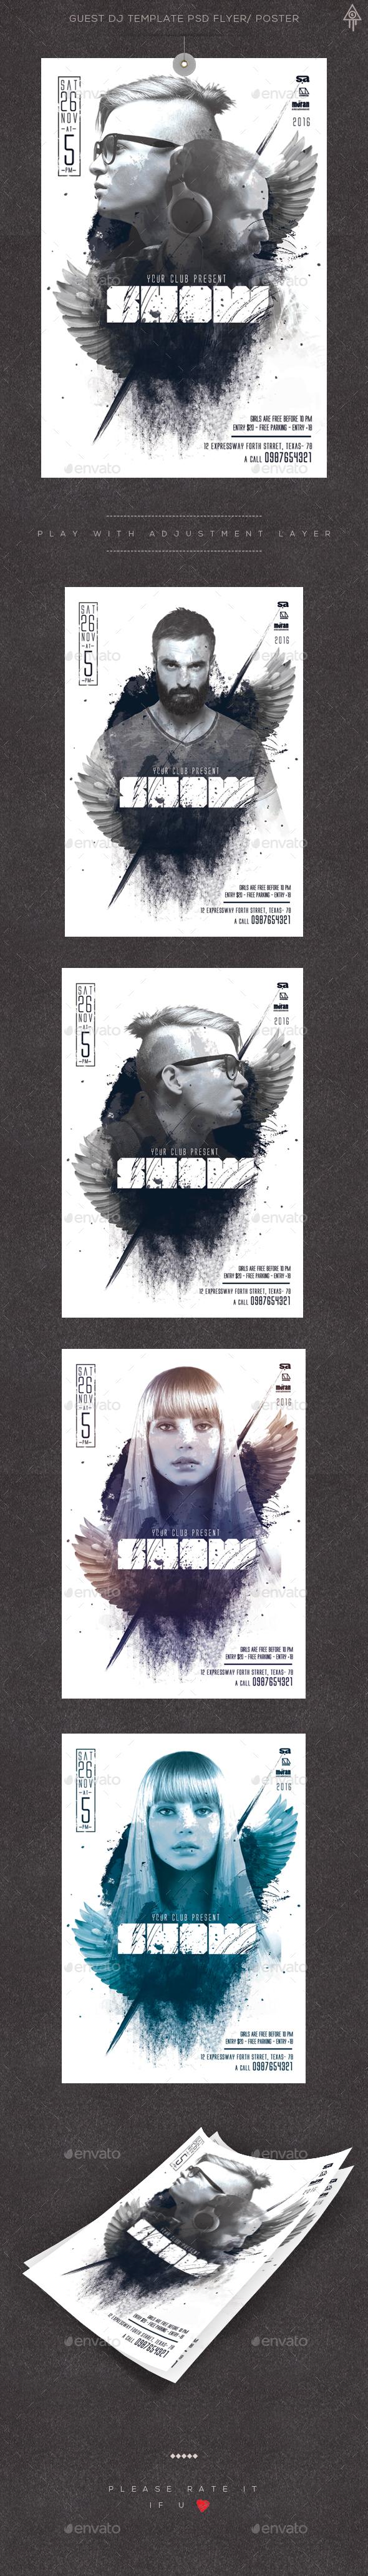 Guest DJ Template PSD Flyer/ Poster - Clubs & Parties Events